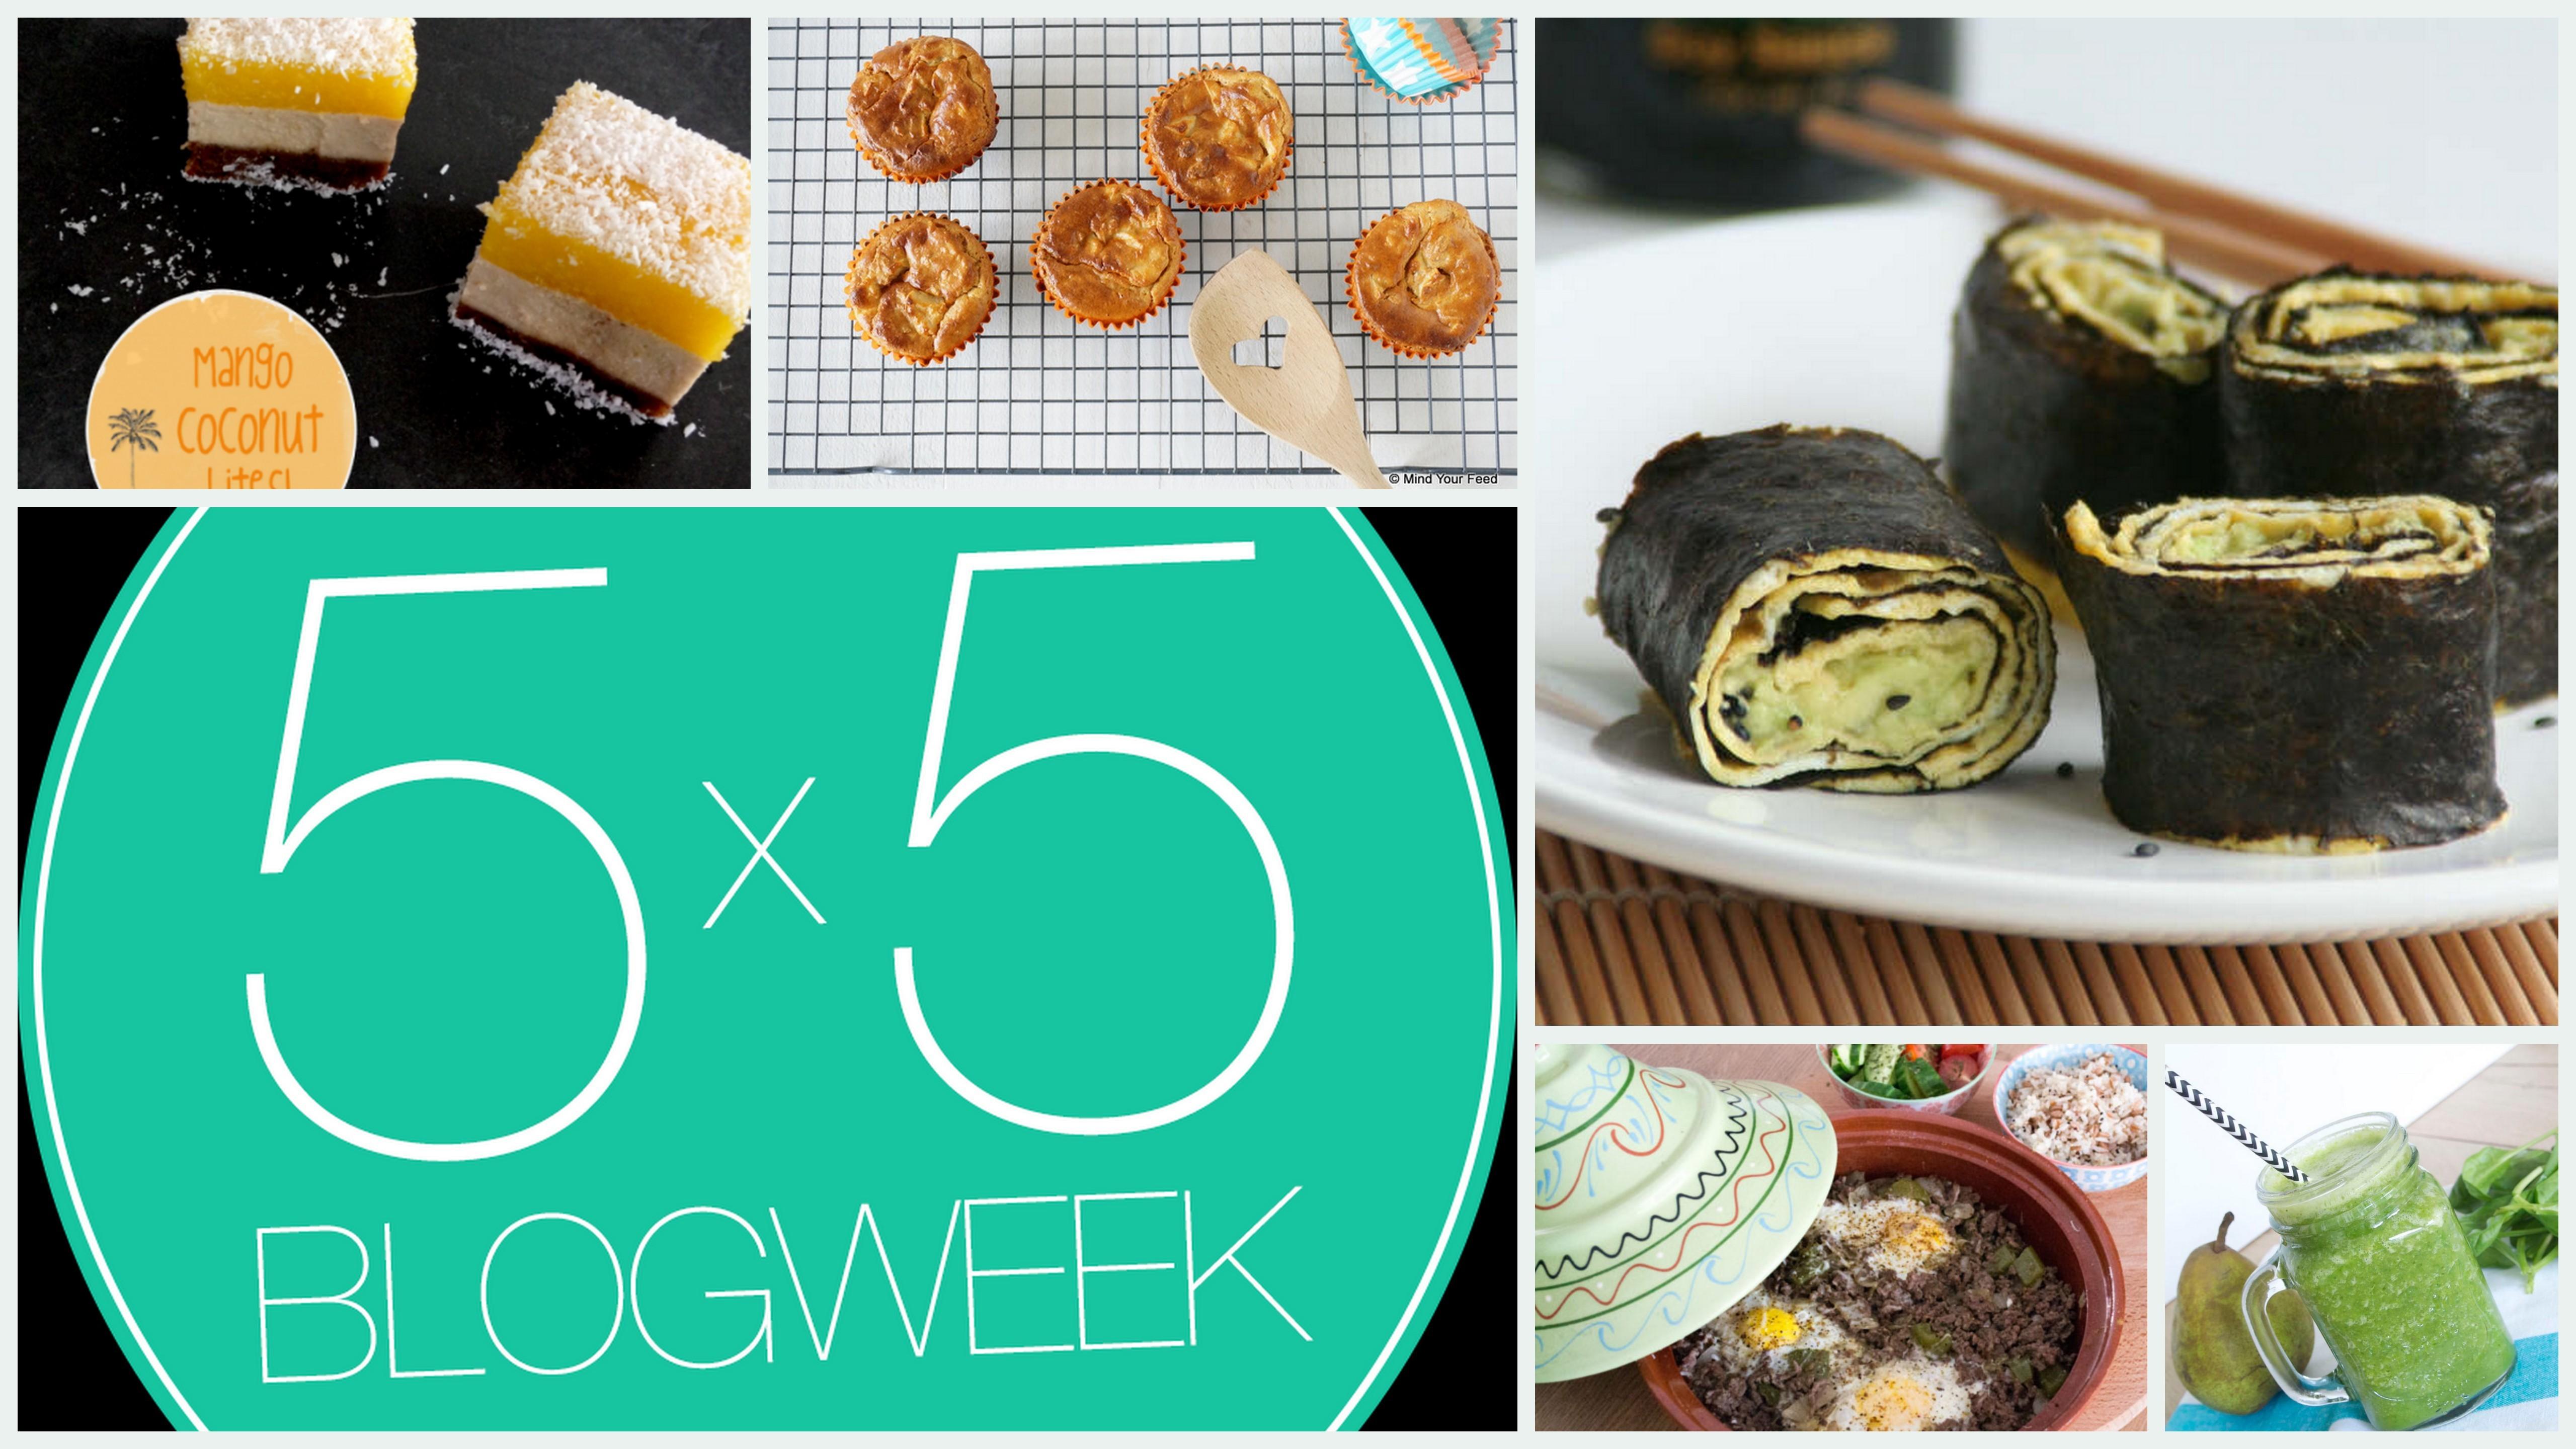 5x5 blog